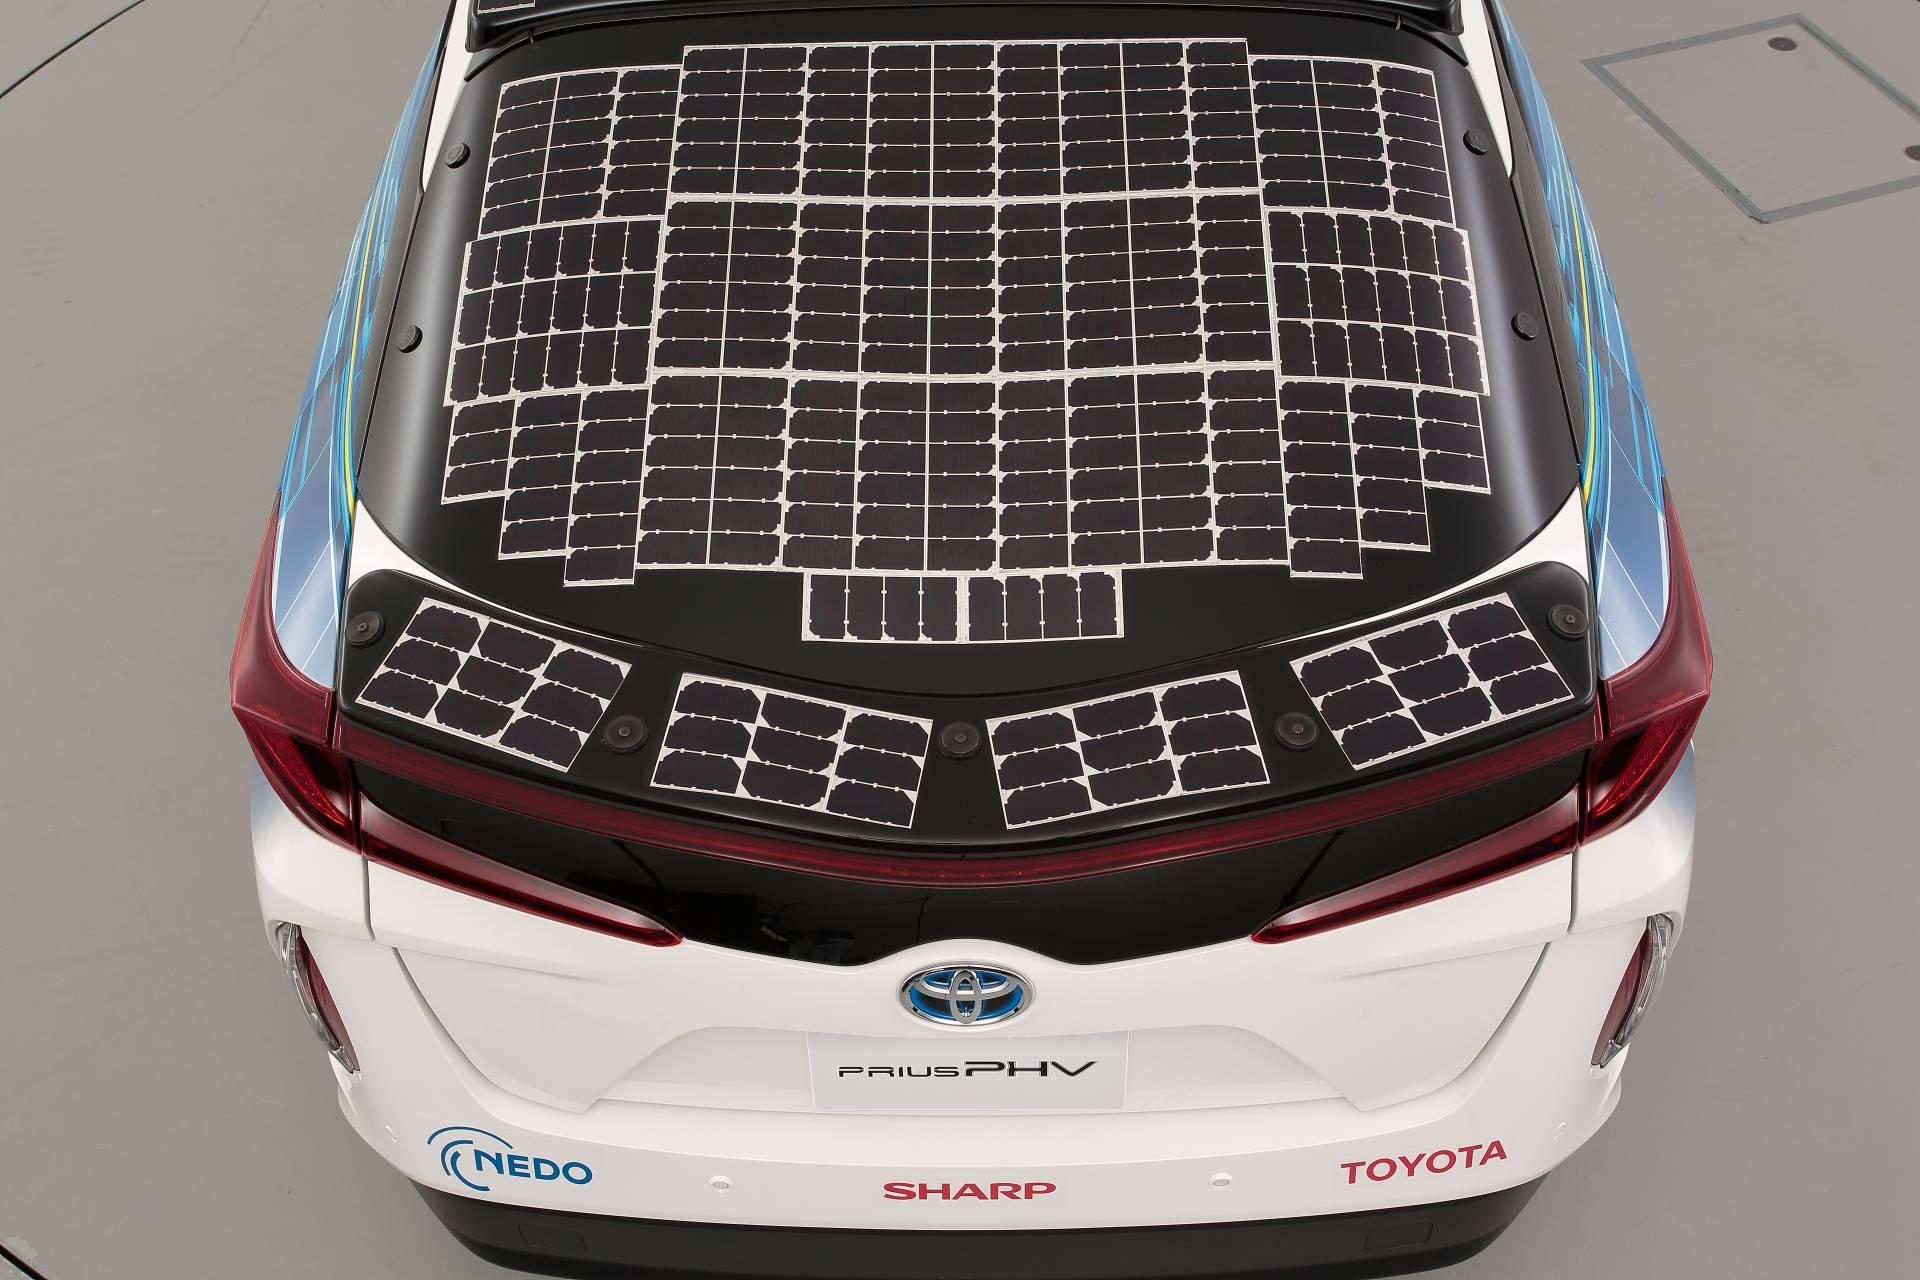 Toyota-Prius-Prime-With-Solar-Panels-13